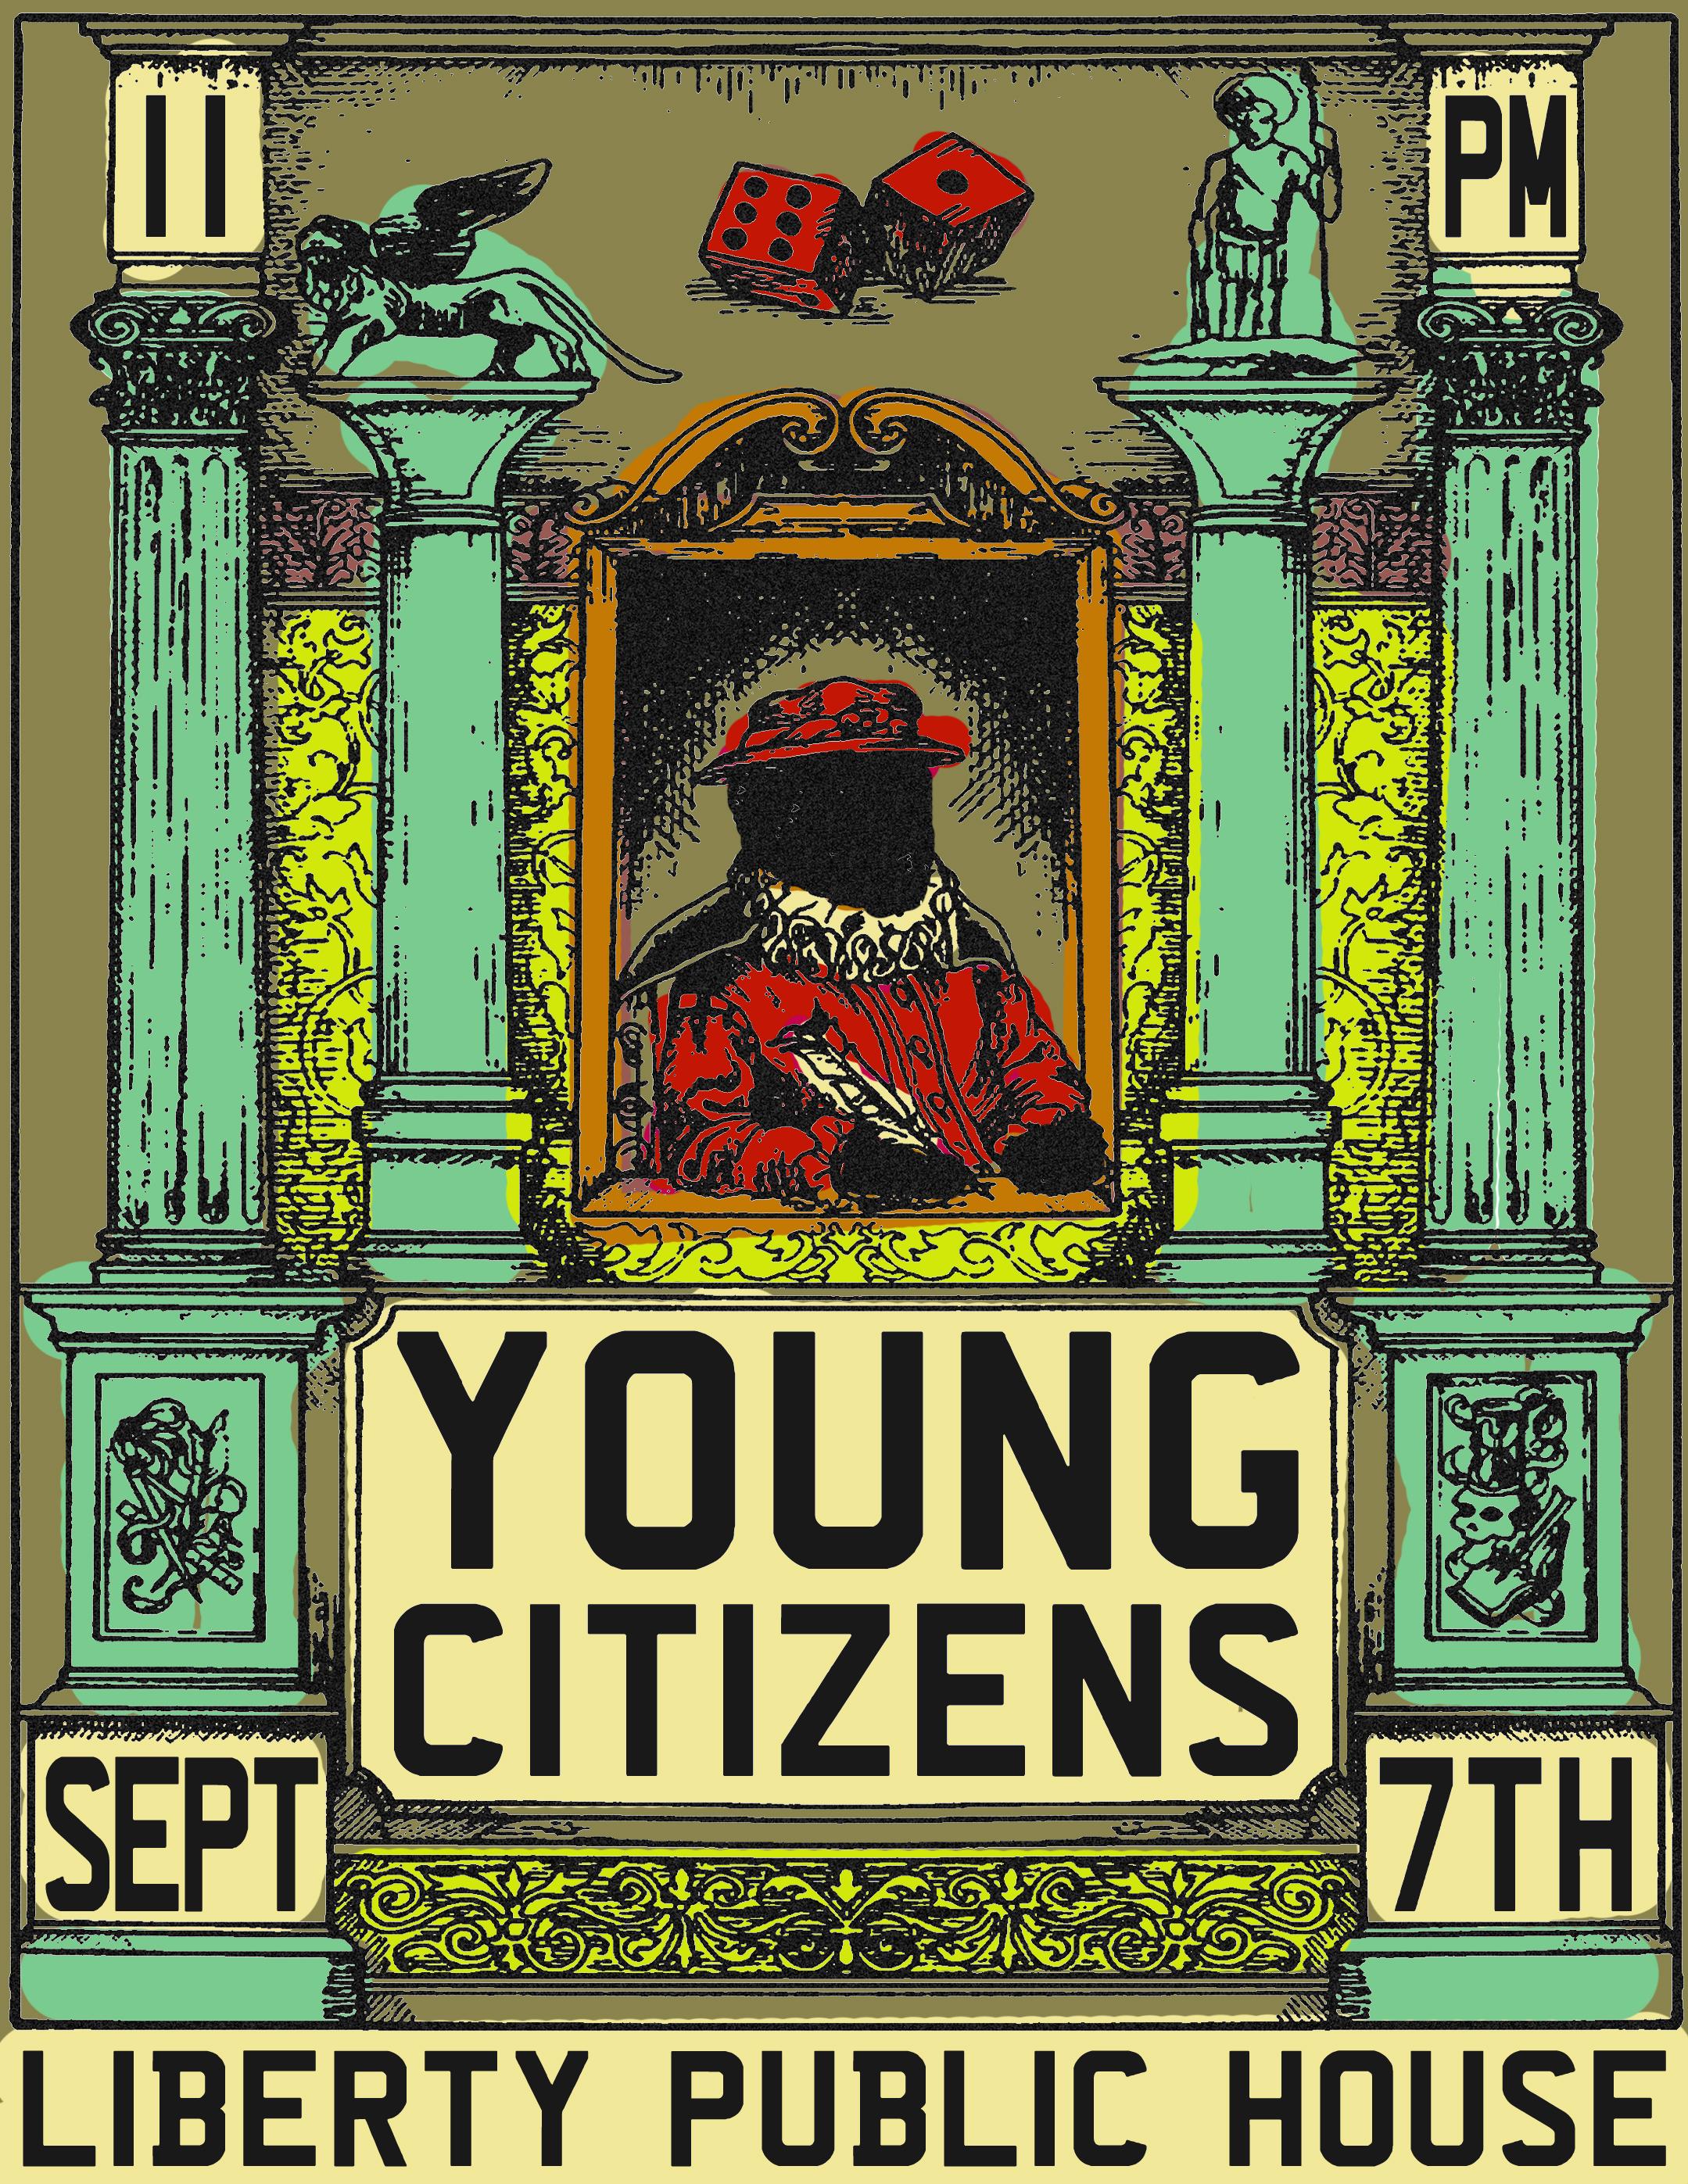 YOUNG CITIZENS Sept 7.jpg